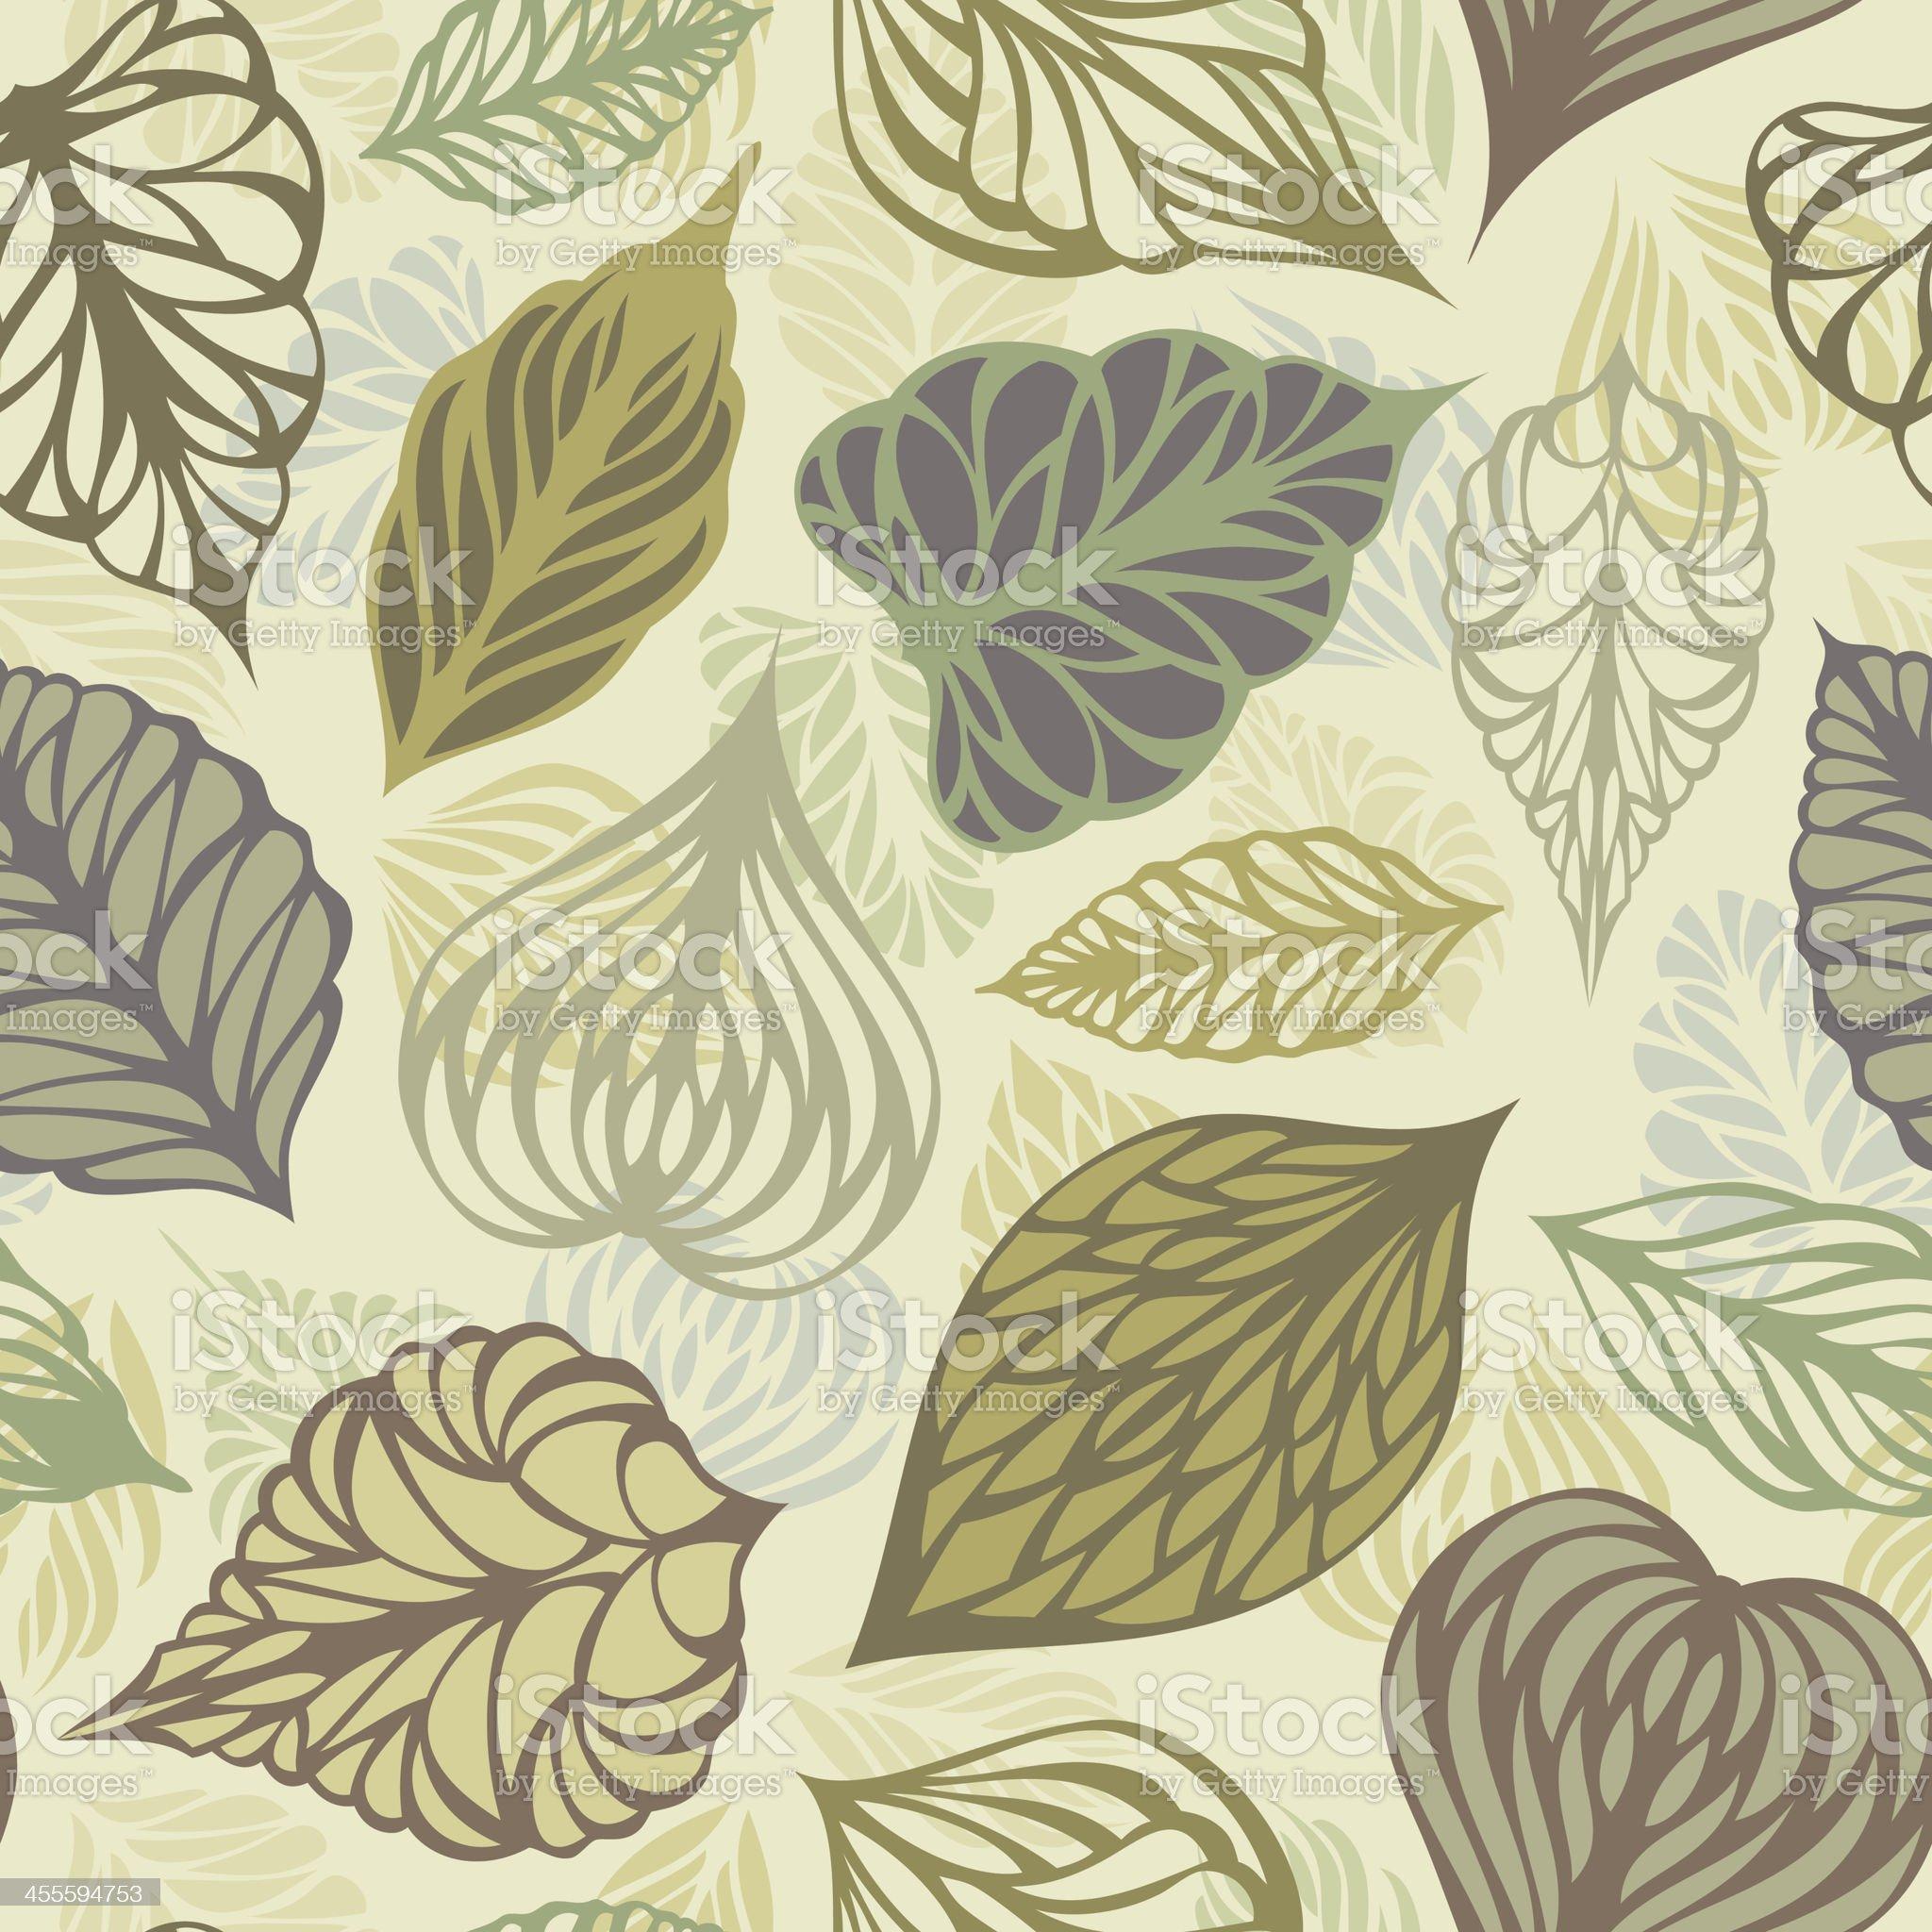 Retro seamless leaves pattern royalty-free stock vector art